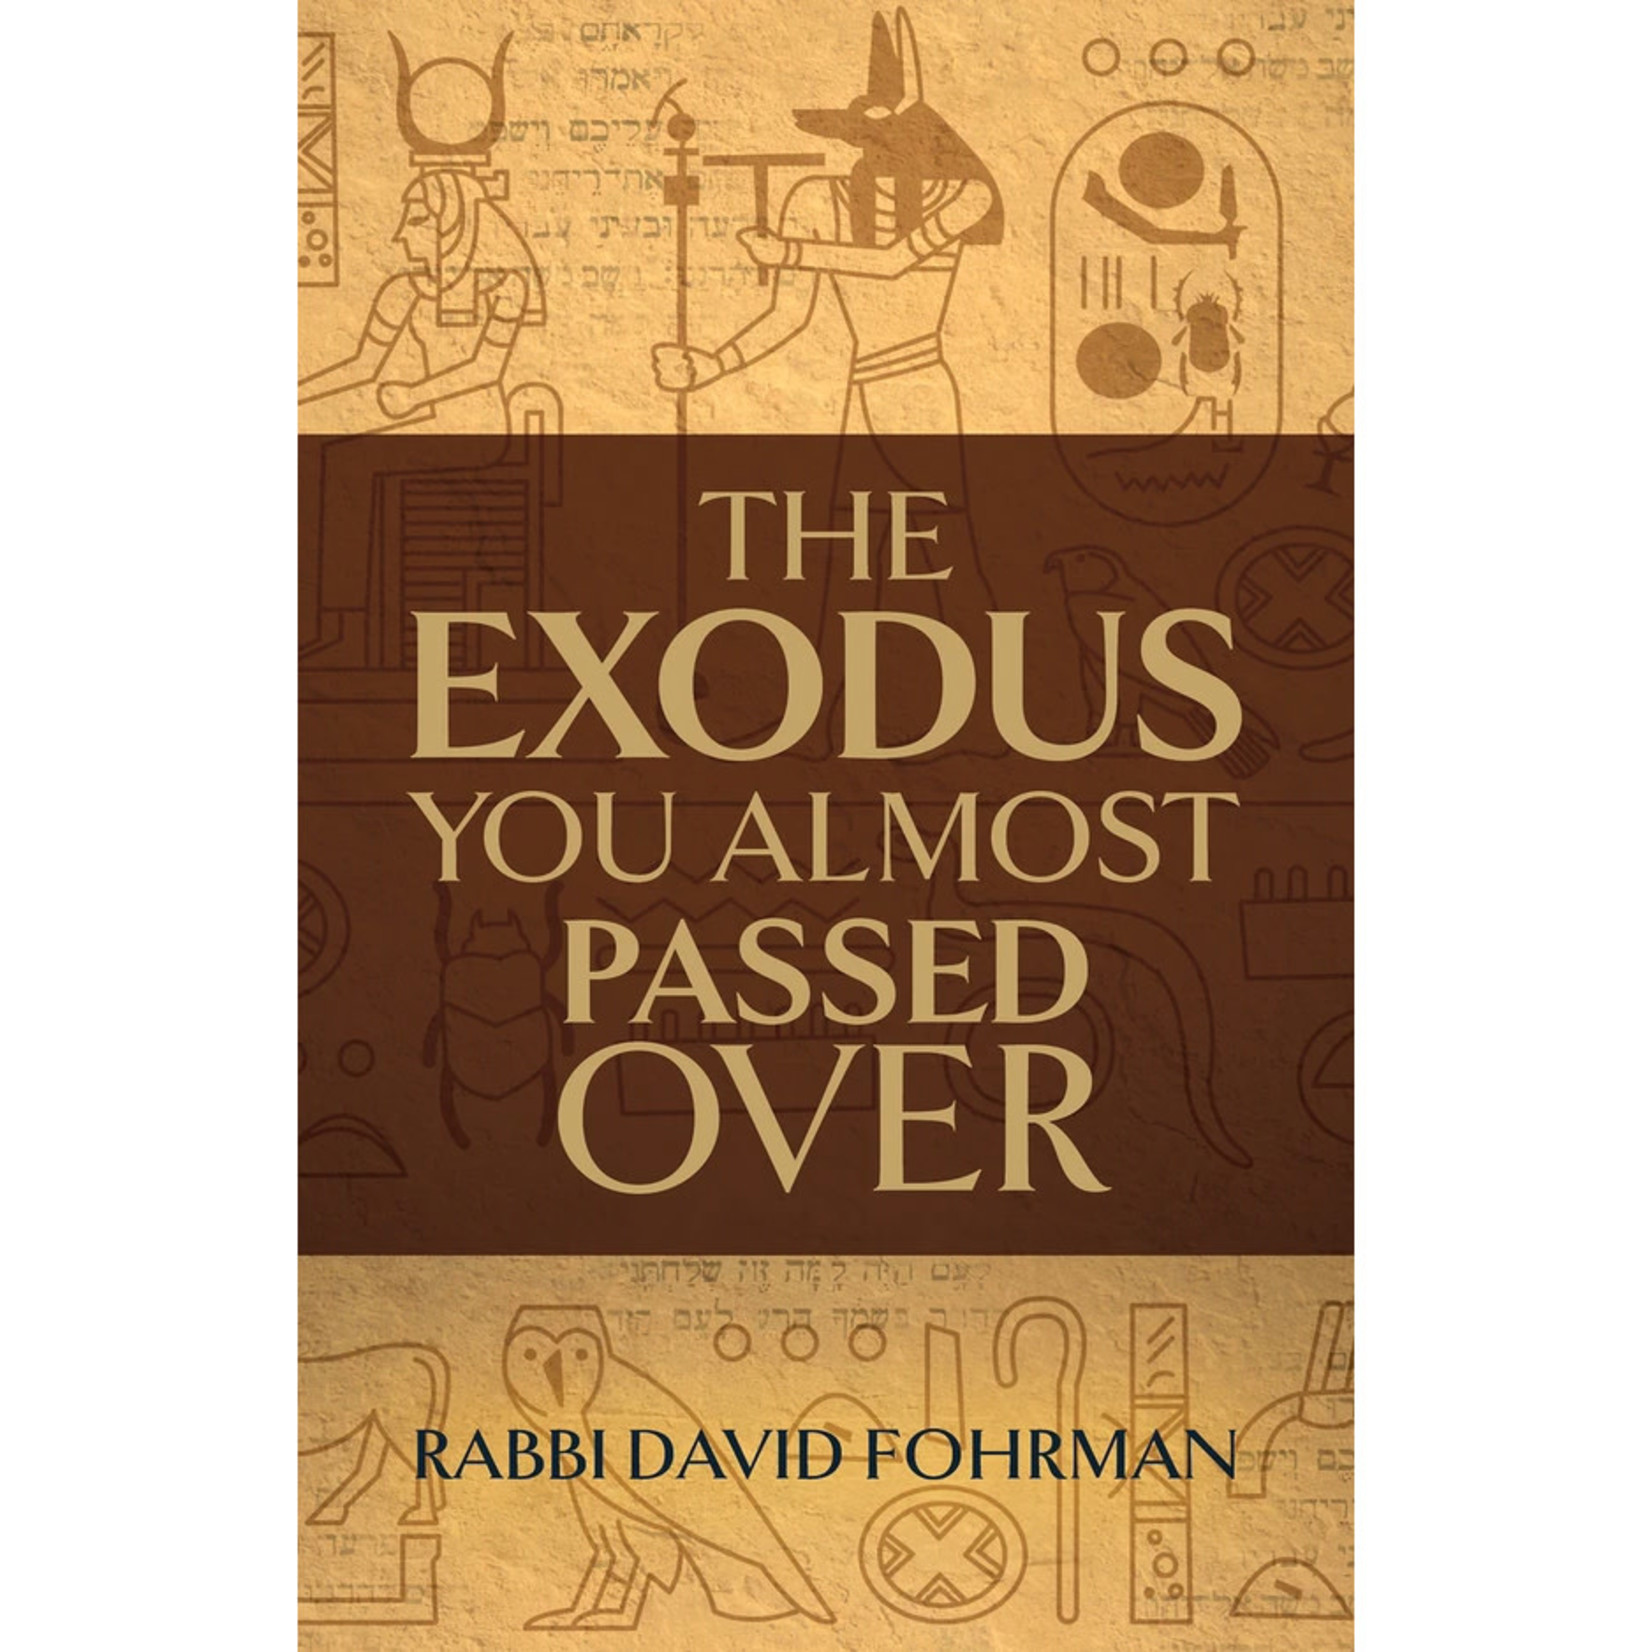 Rabbi David Fohrman Exodus You Almost Passed Over, The